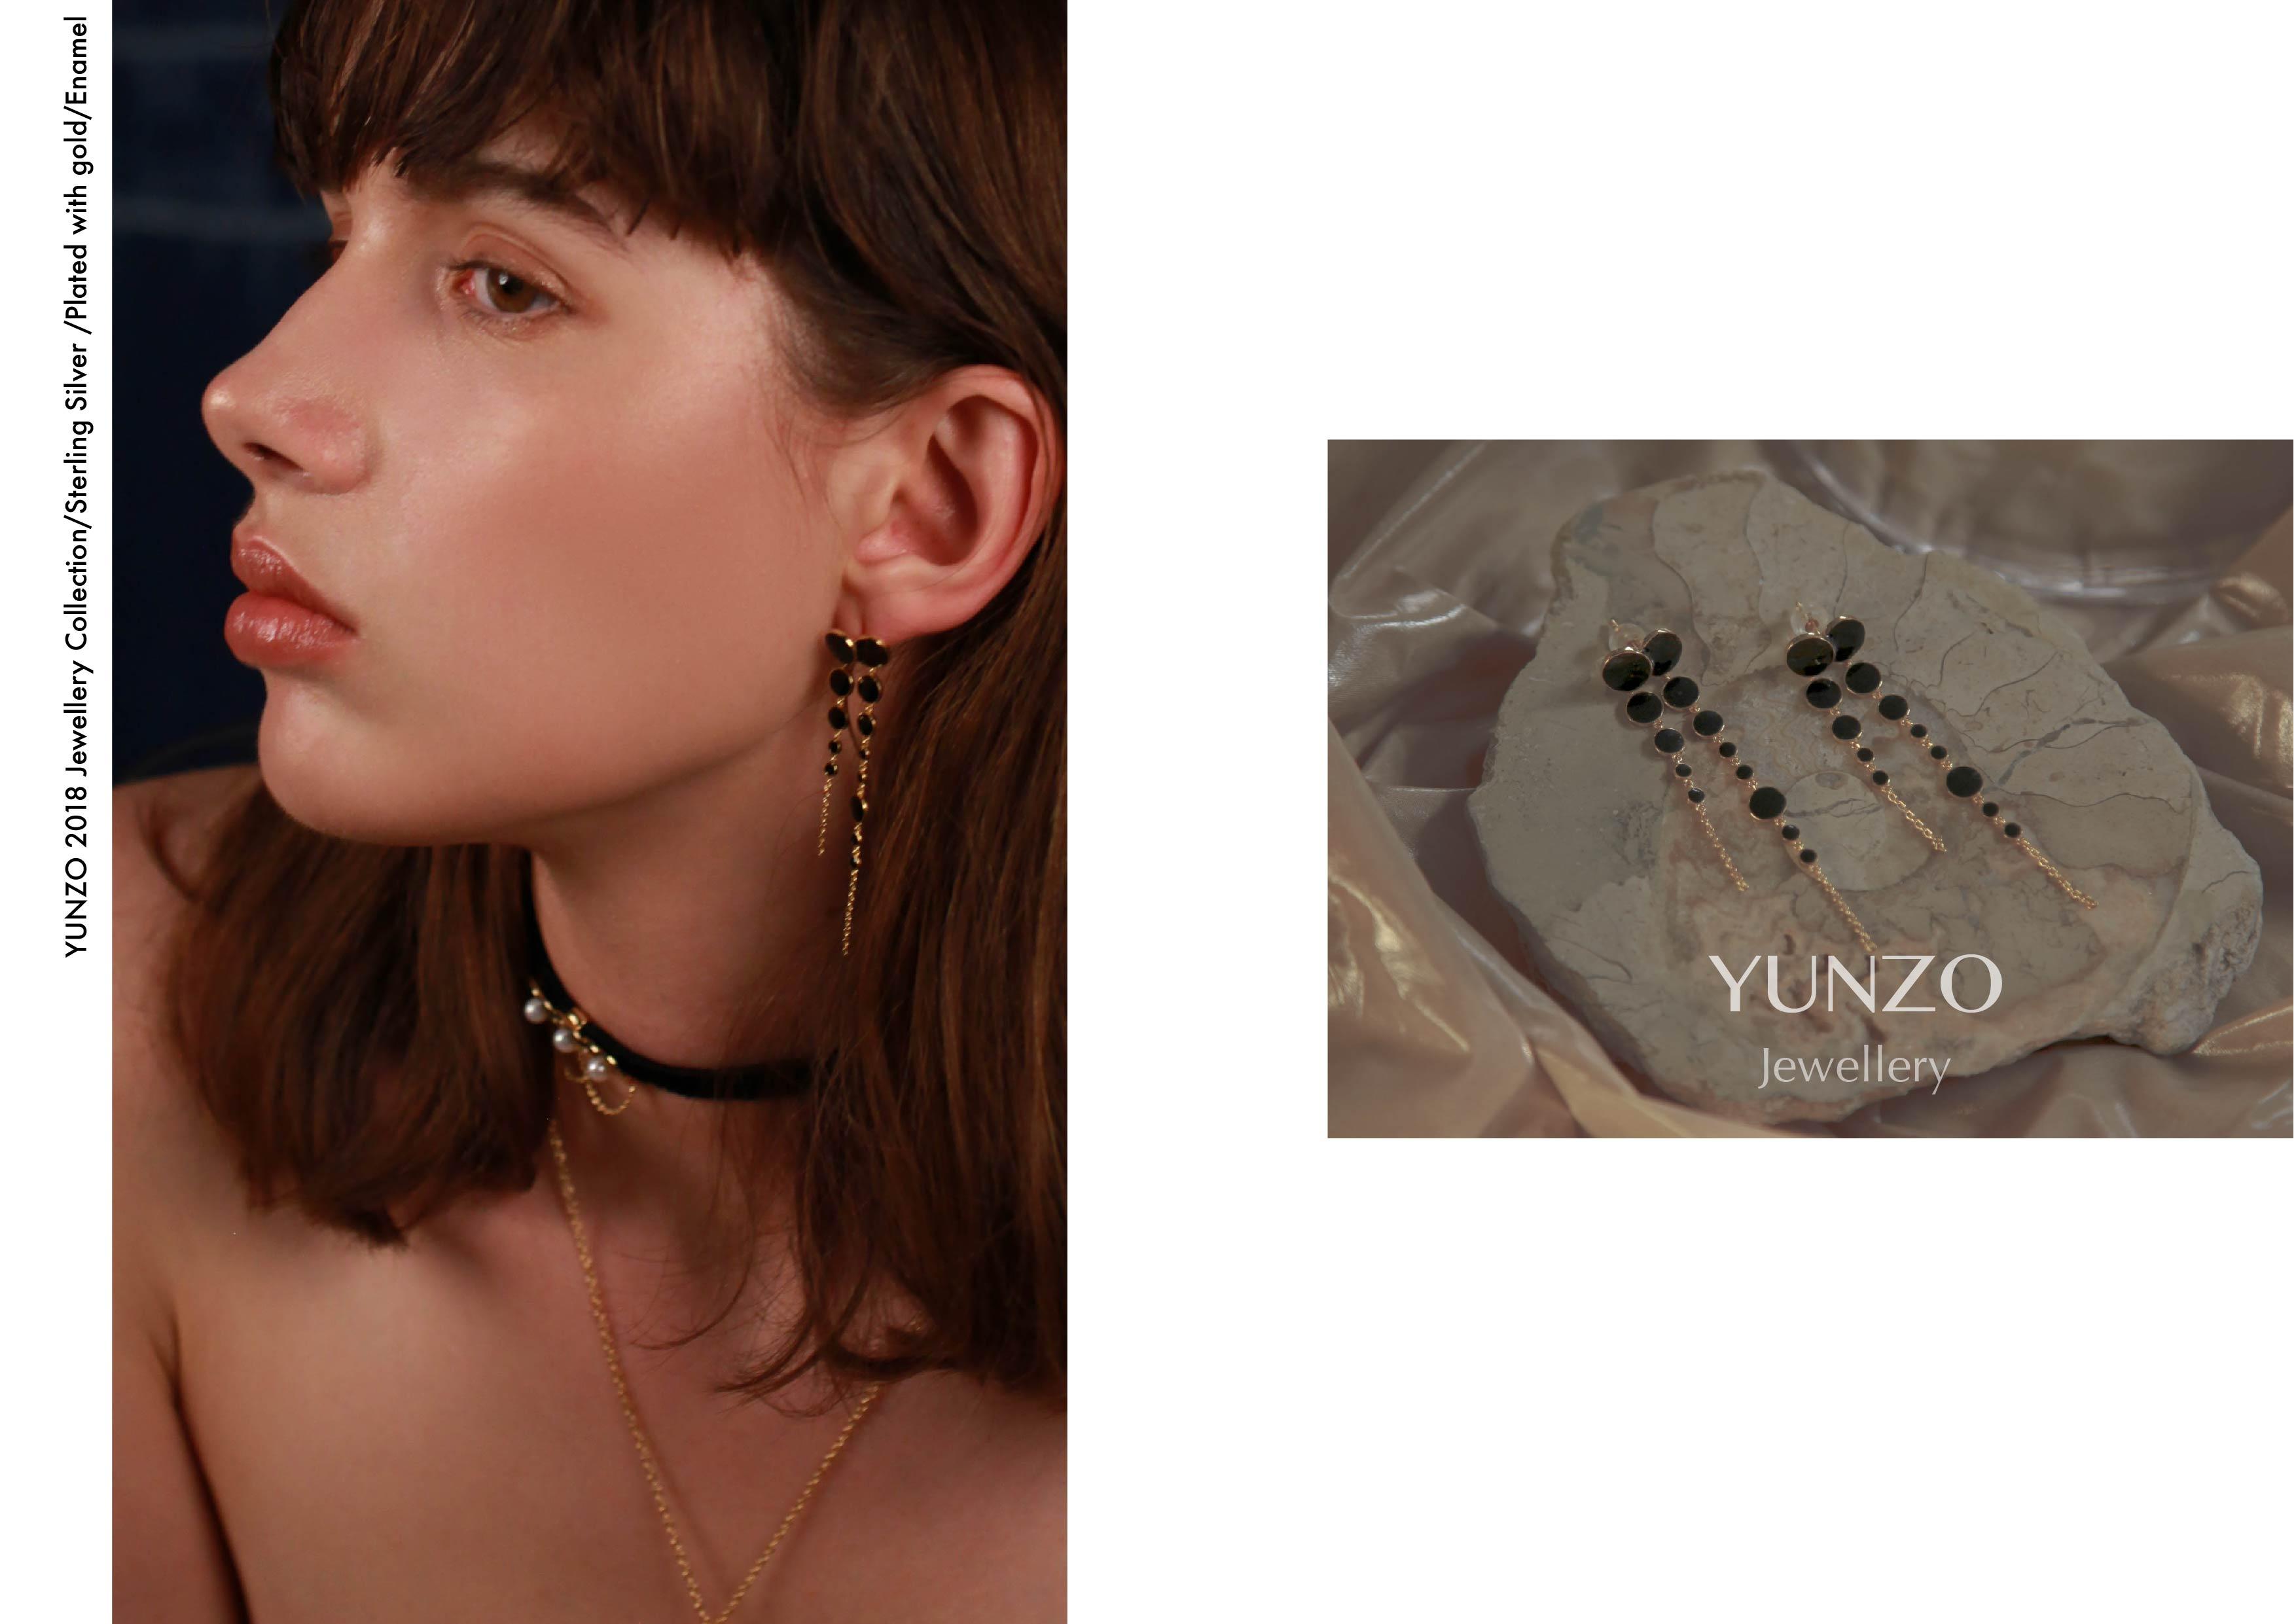 Gold Black Enamel Drop Earrings by YUNZO on curated-crowd.com